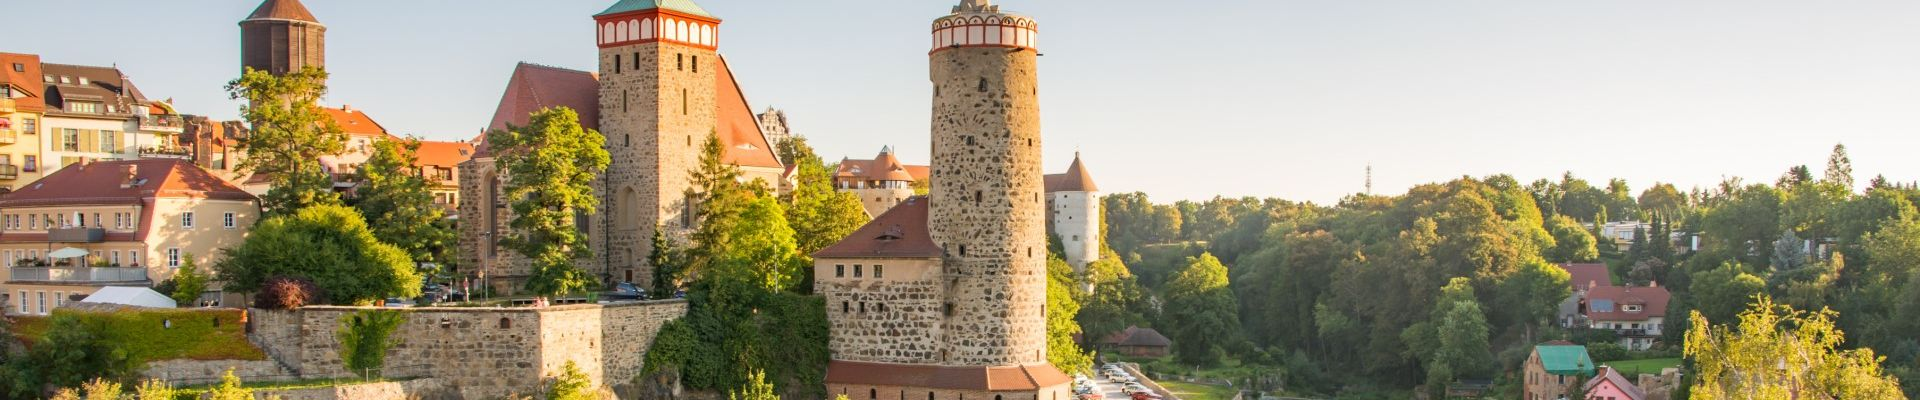 Kurzurlaub in Ostdeutschland